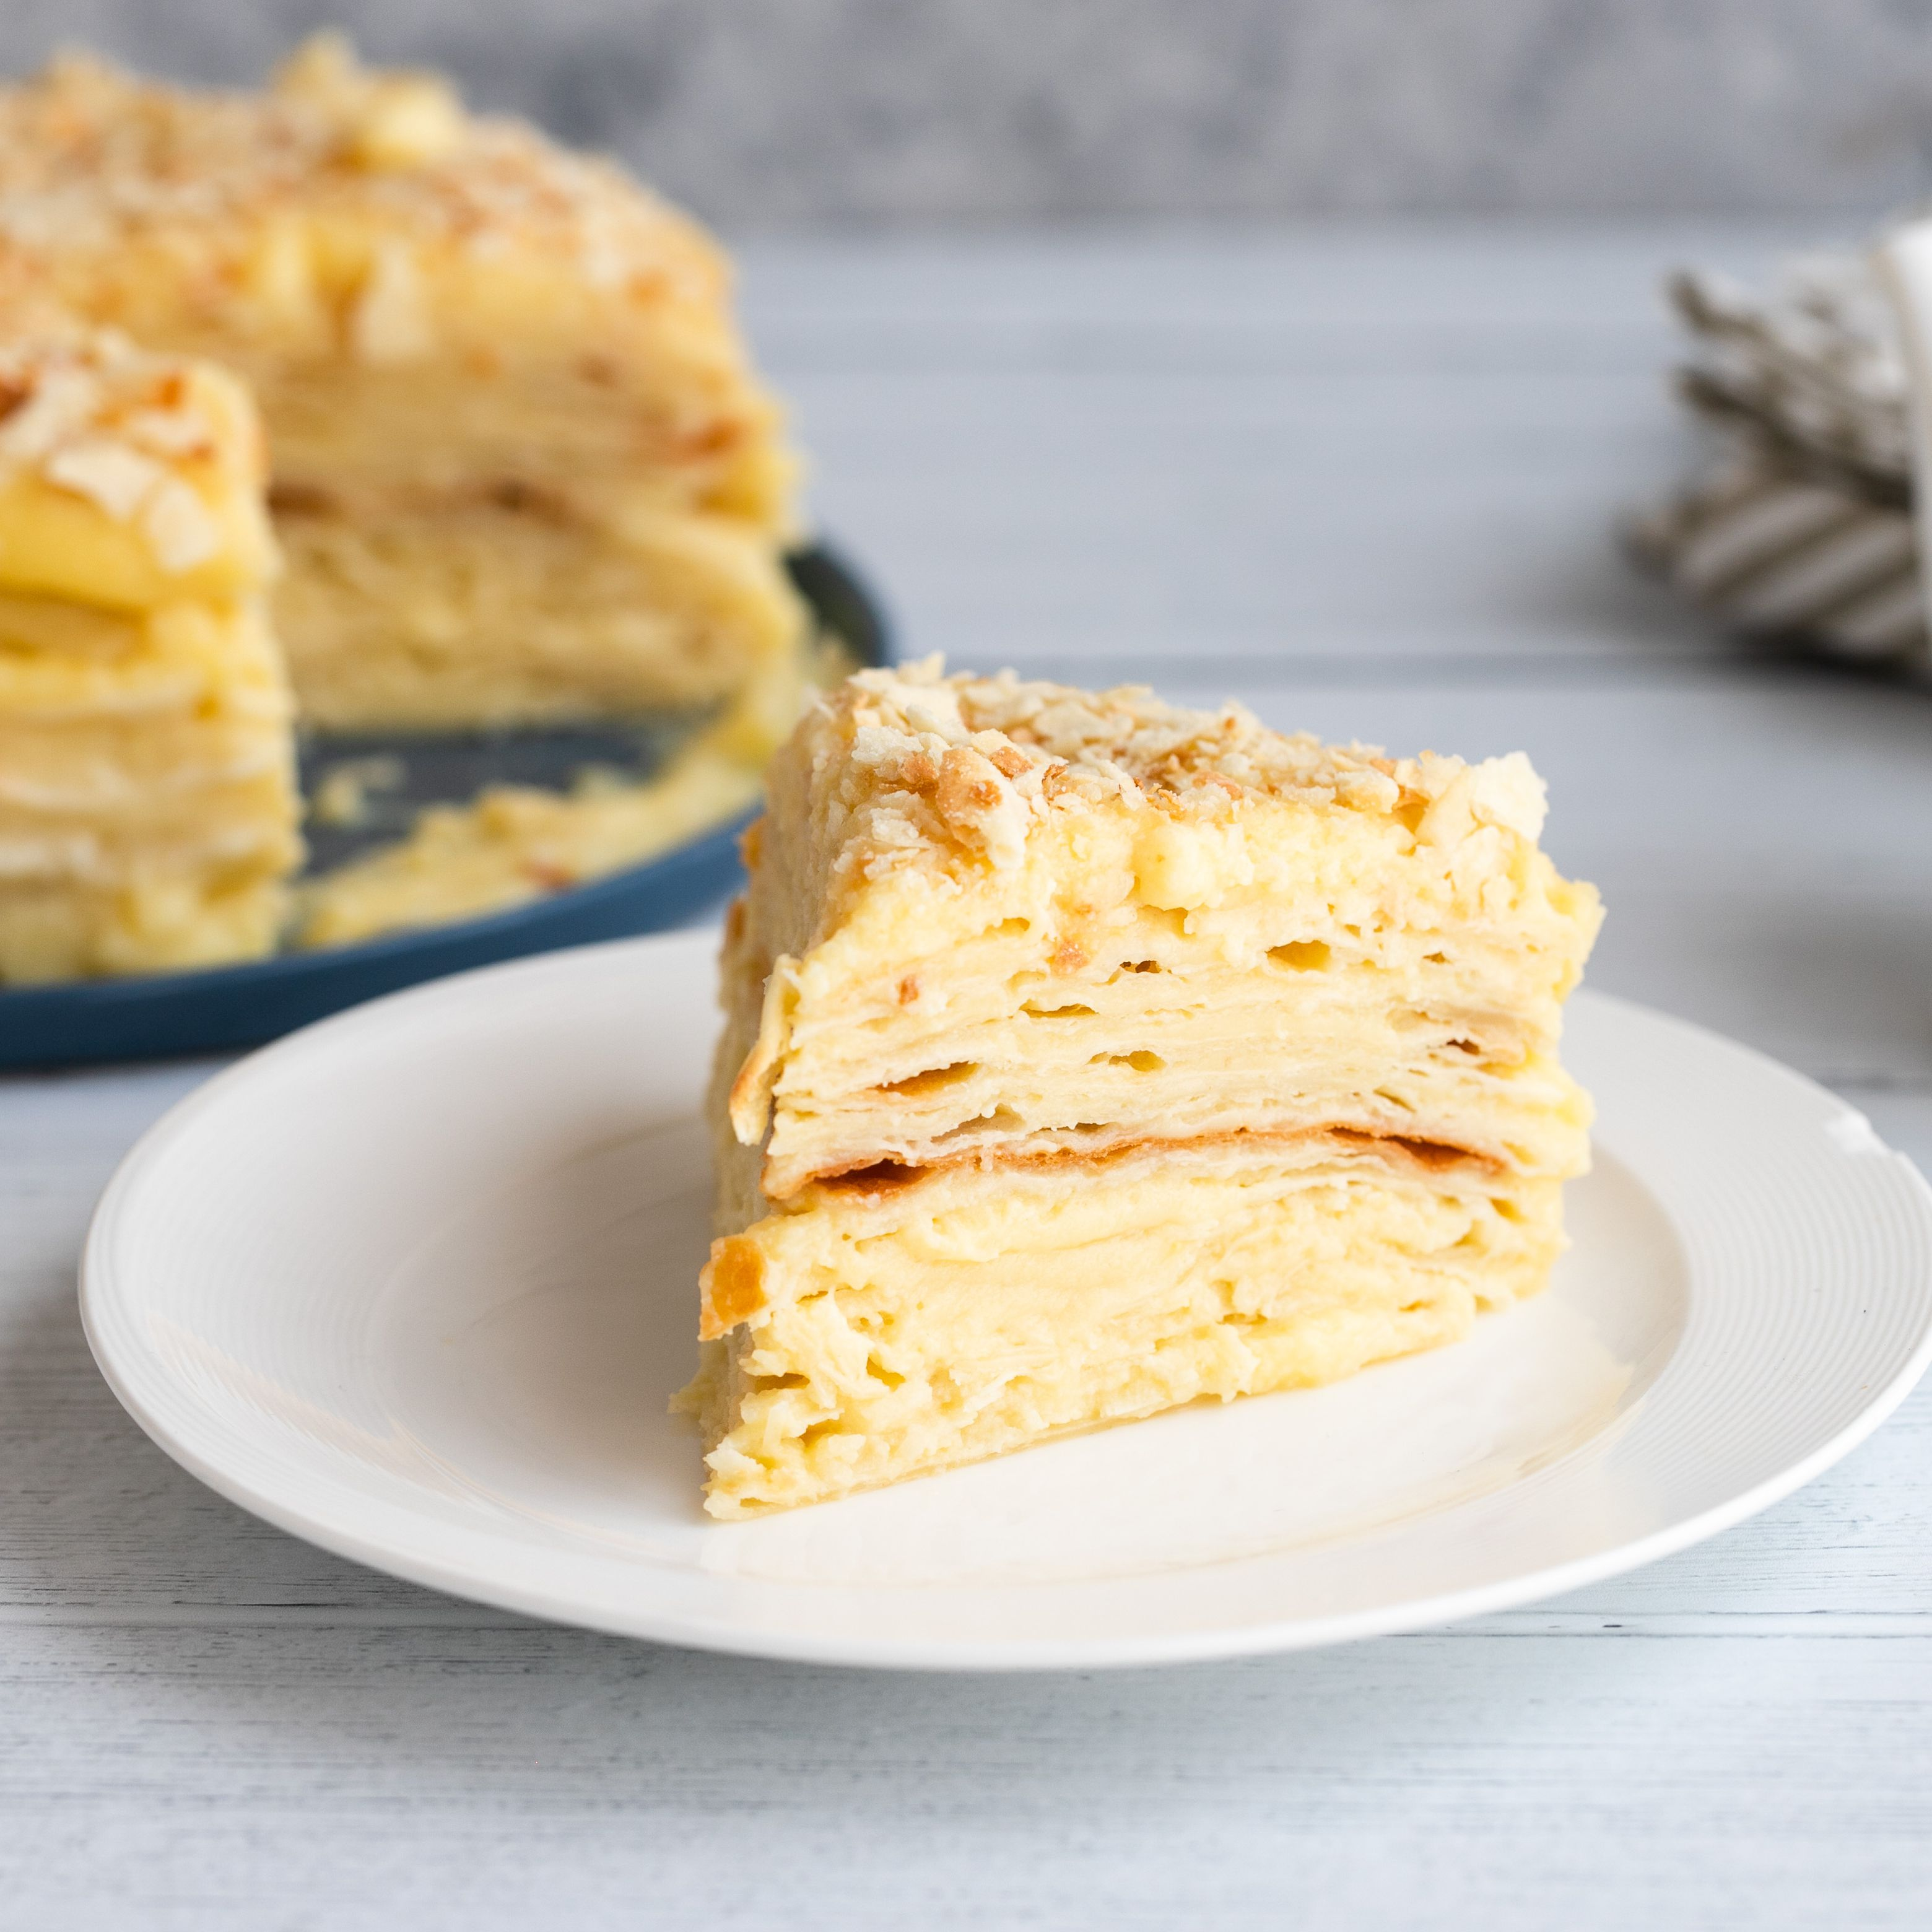 Russian Napoleon Cake (Napolyeon Tort)